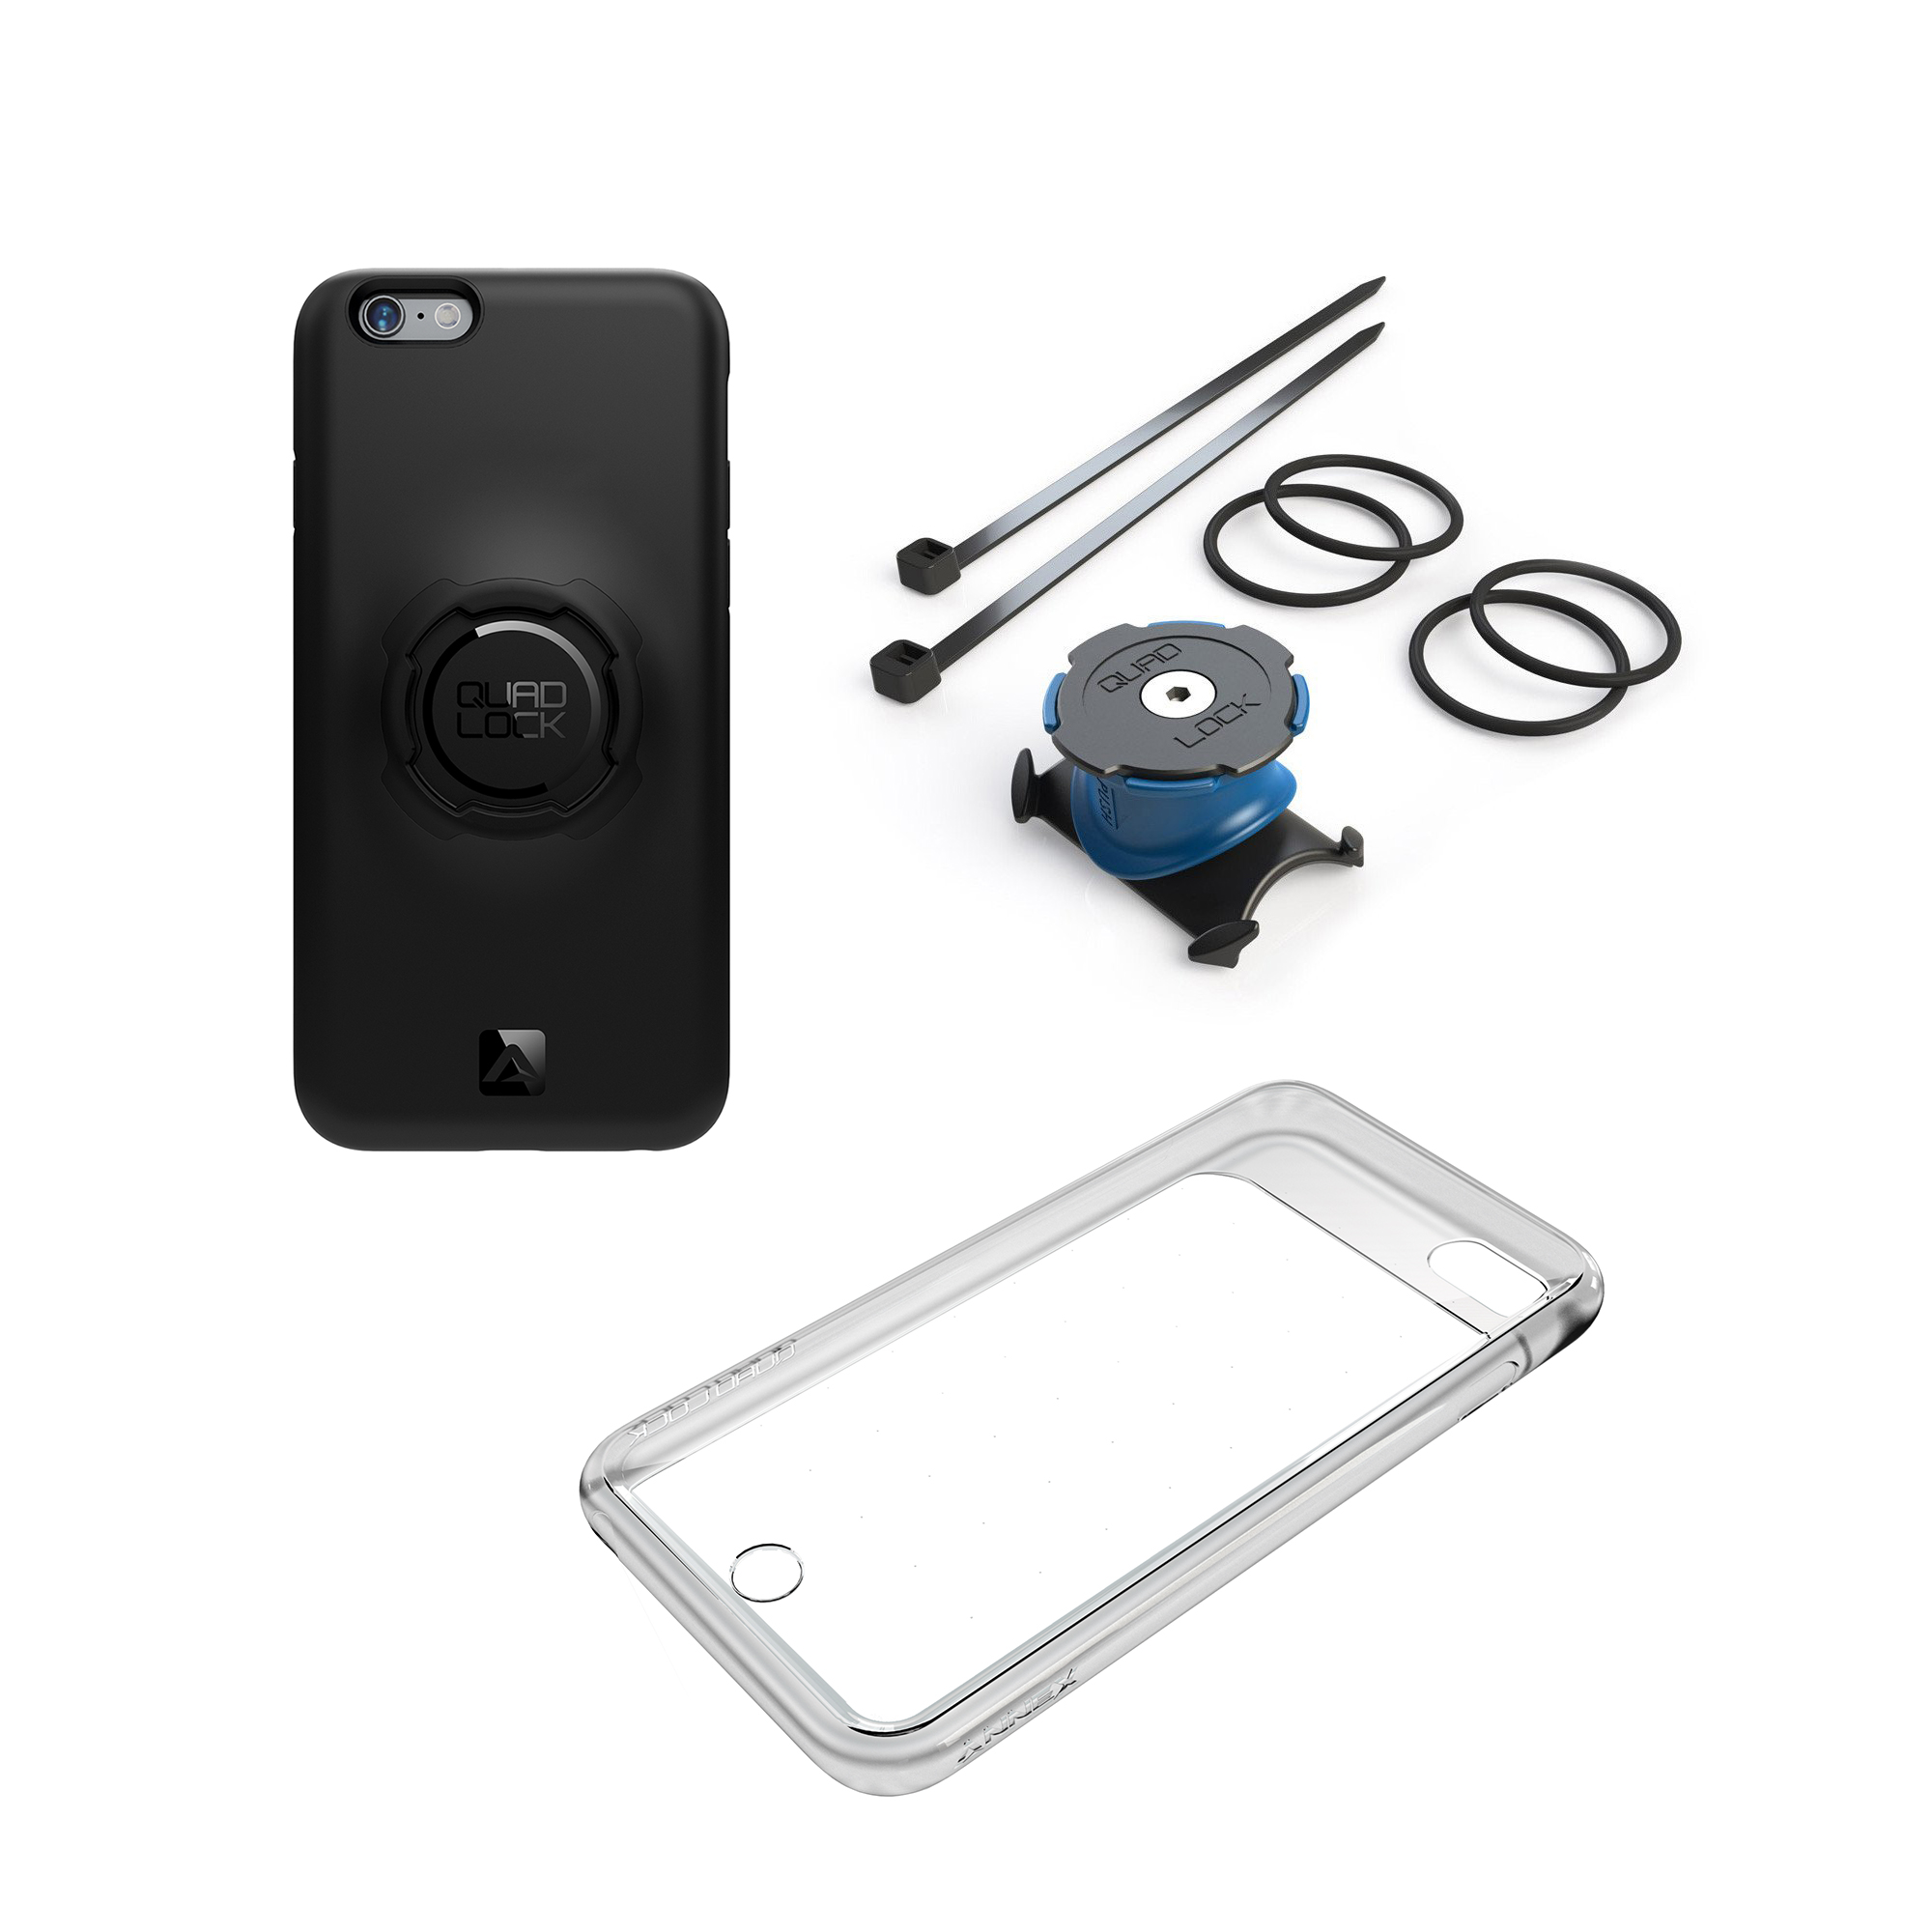 quad lock bike kit halterung h lle f r iphone 6 6s online kaufen bmo bike mailorder. Black Bedroom Furniture Sets. Home Design Ideas